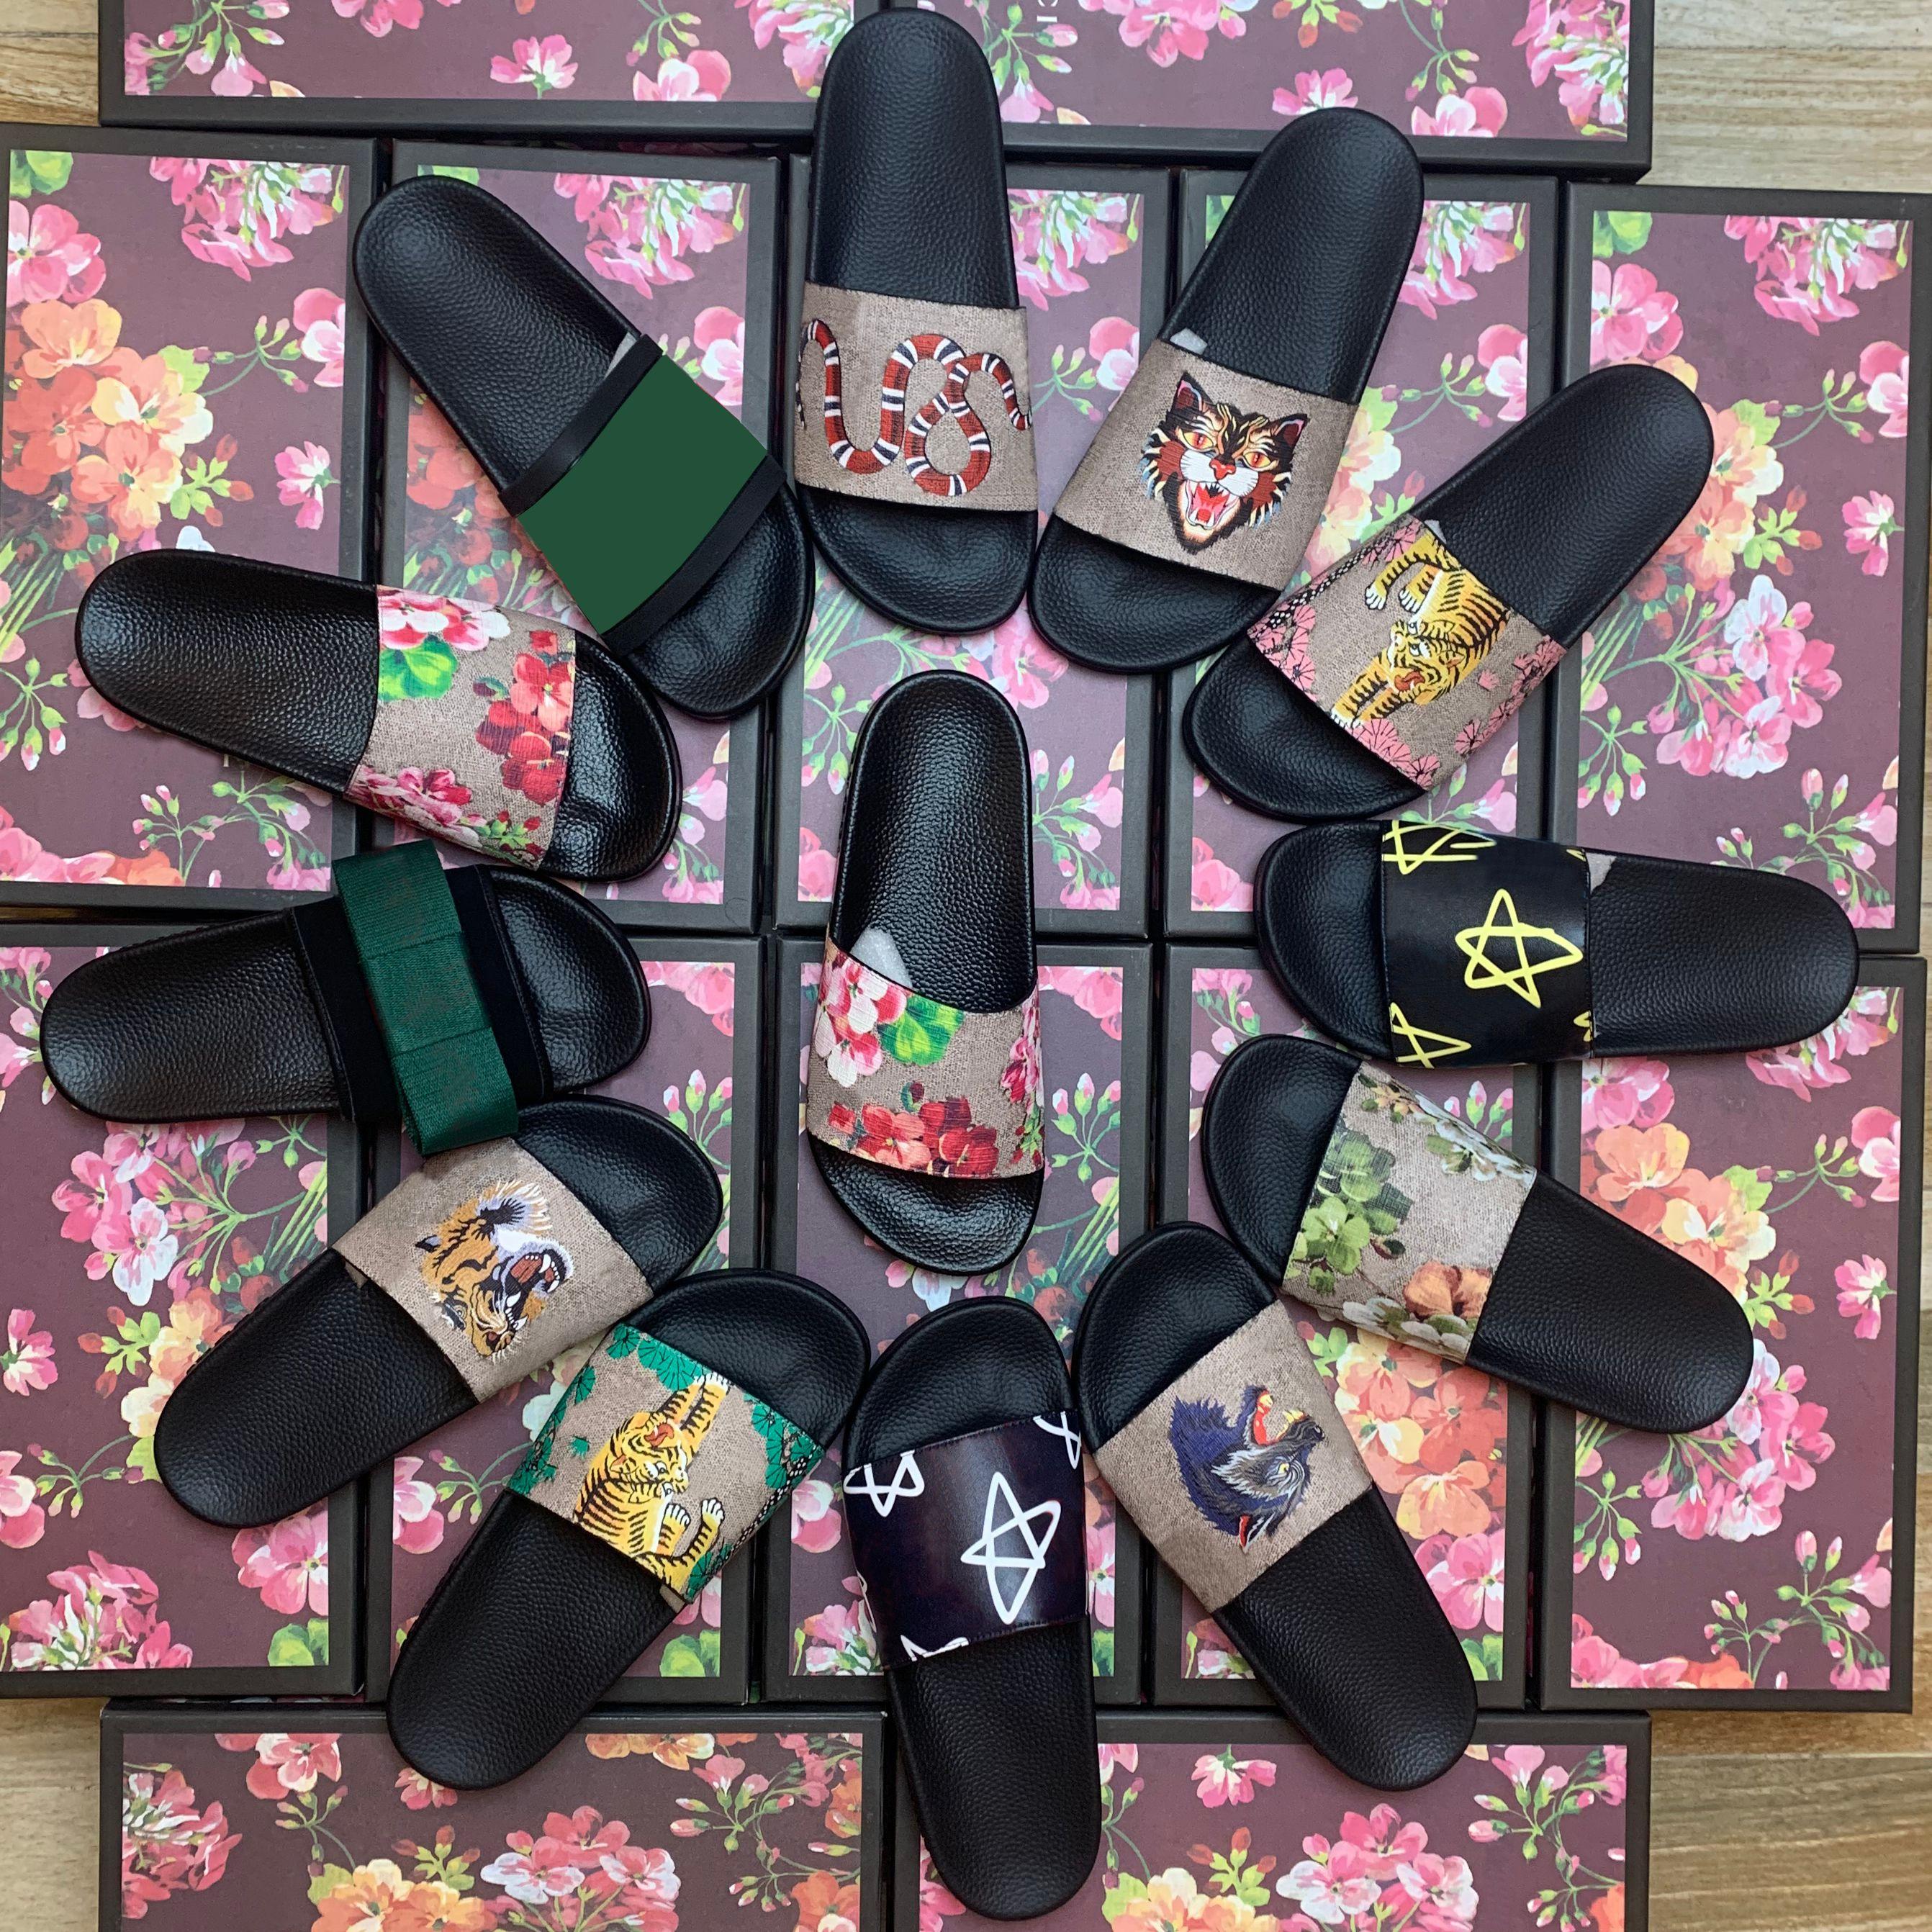 New Hot Un Donne Sandali Sandali Scarpe Pantofole Pearl Serpente Snake Slide 2021 Fashion Summer Wide Sandals Sandals Sandals Slipper con scatola Polvere Borsa 35-45